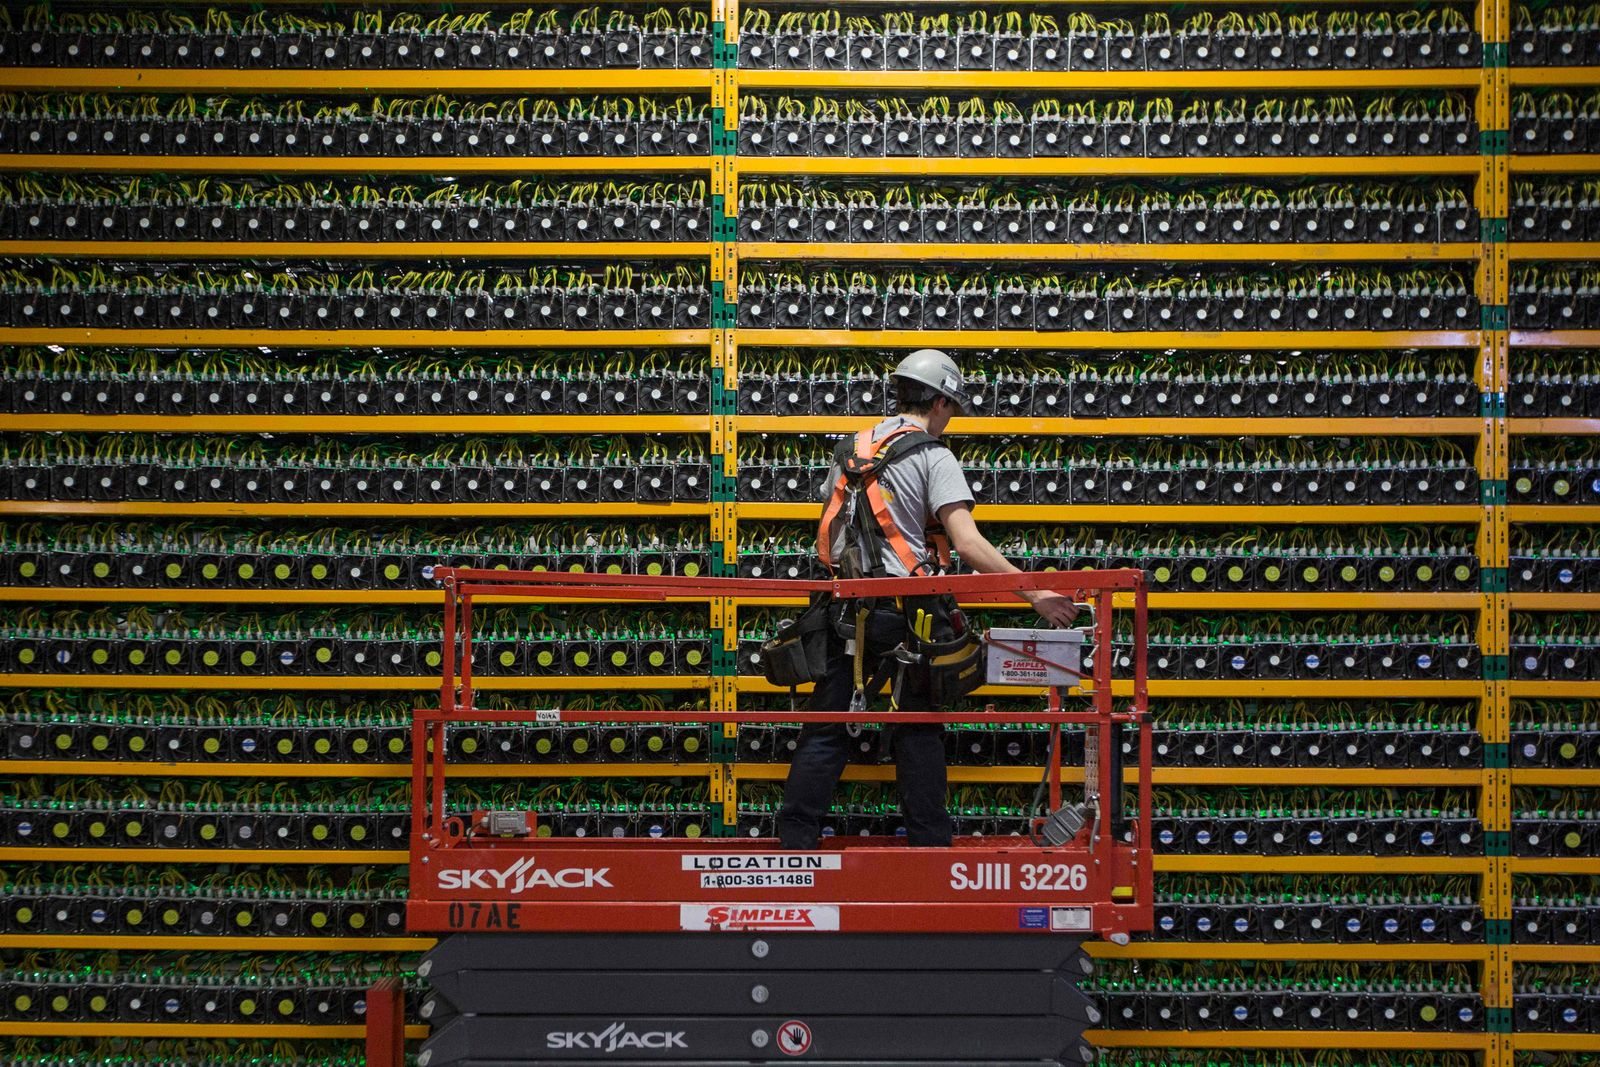 Bitcoin / Mining